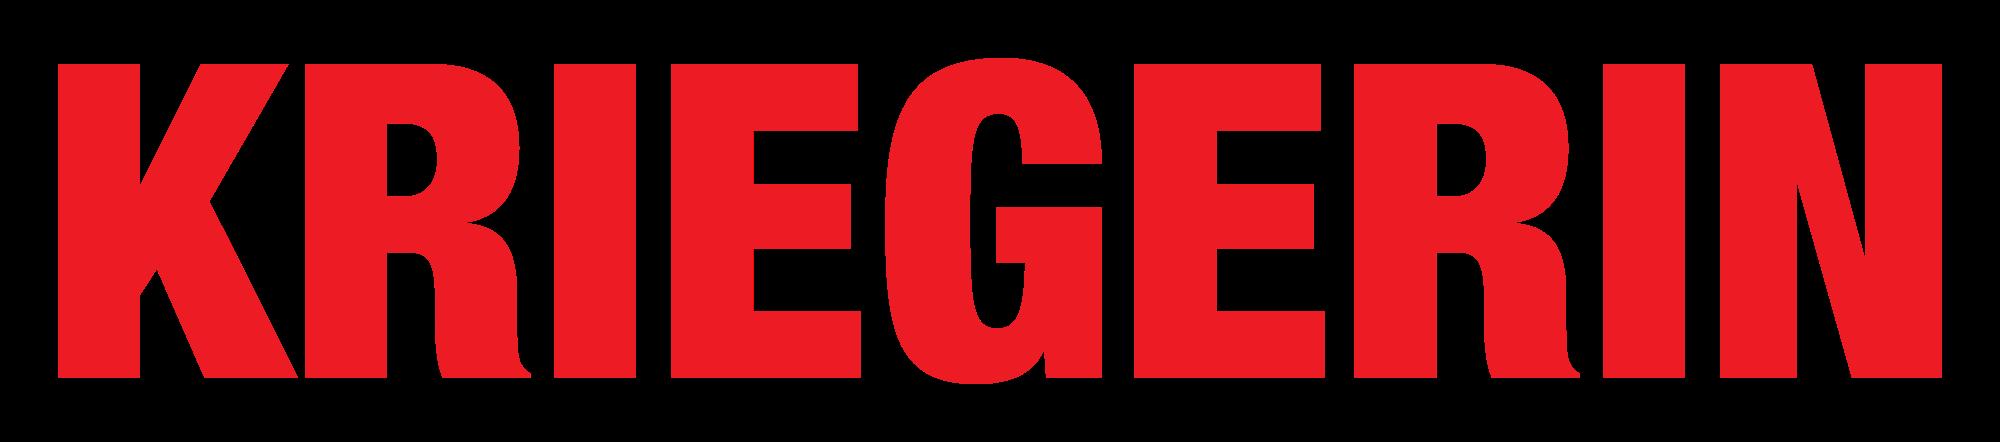 Kriegerin svg #15, Download drawings